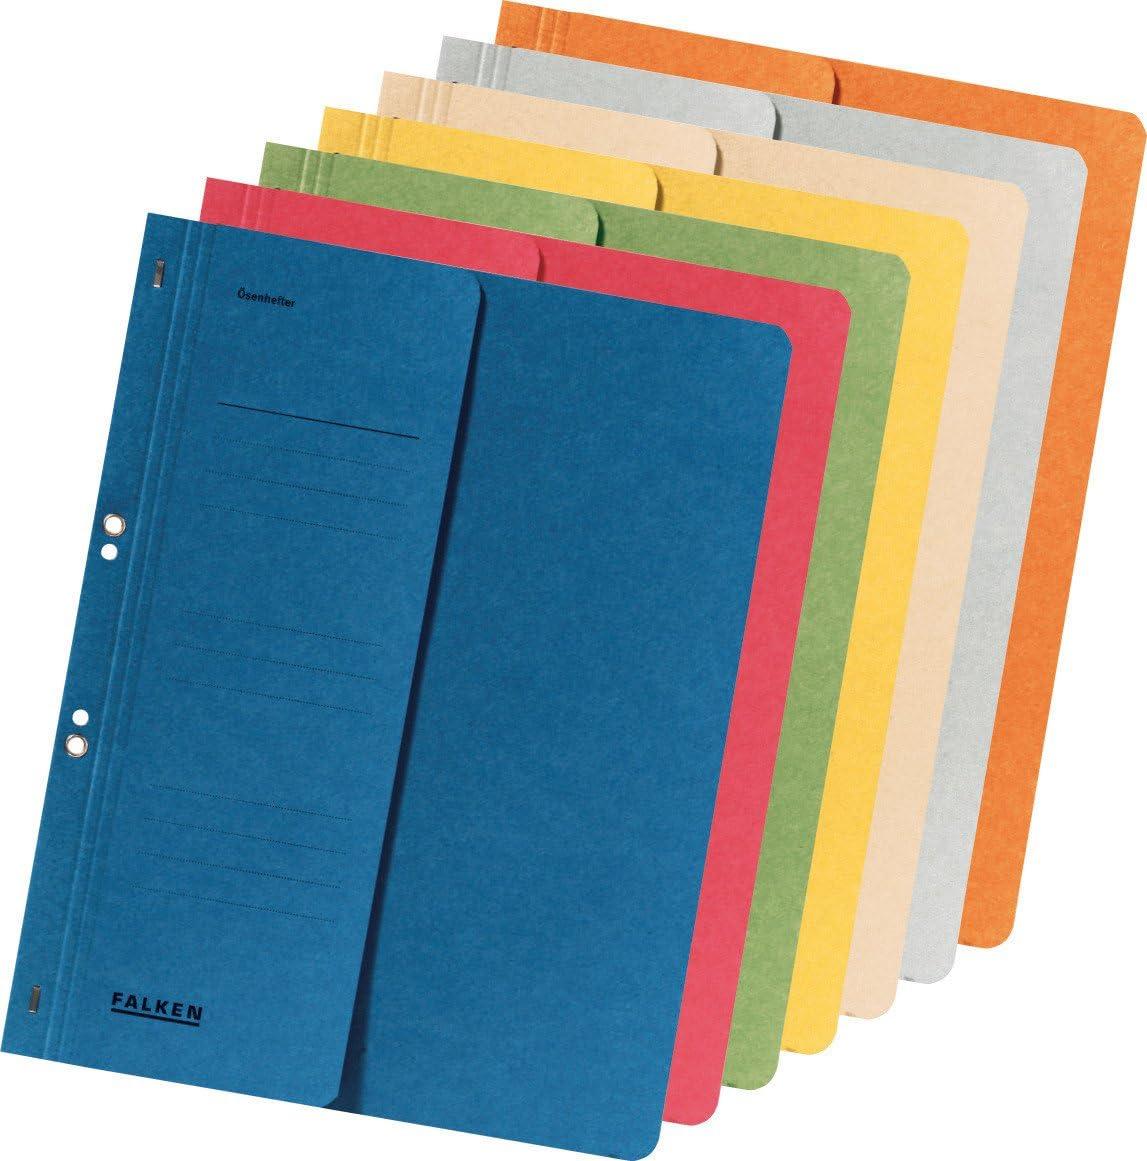 A4 Half Cover FALKEN Eyelet Top-Down Flat Files Grey 250g Pack 50